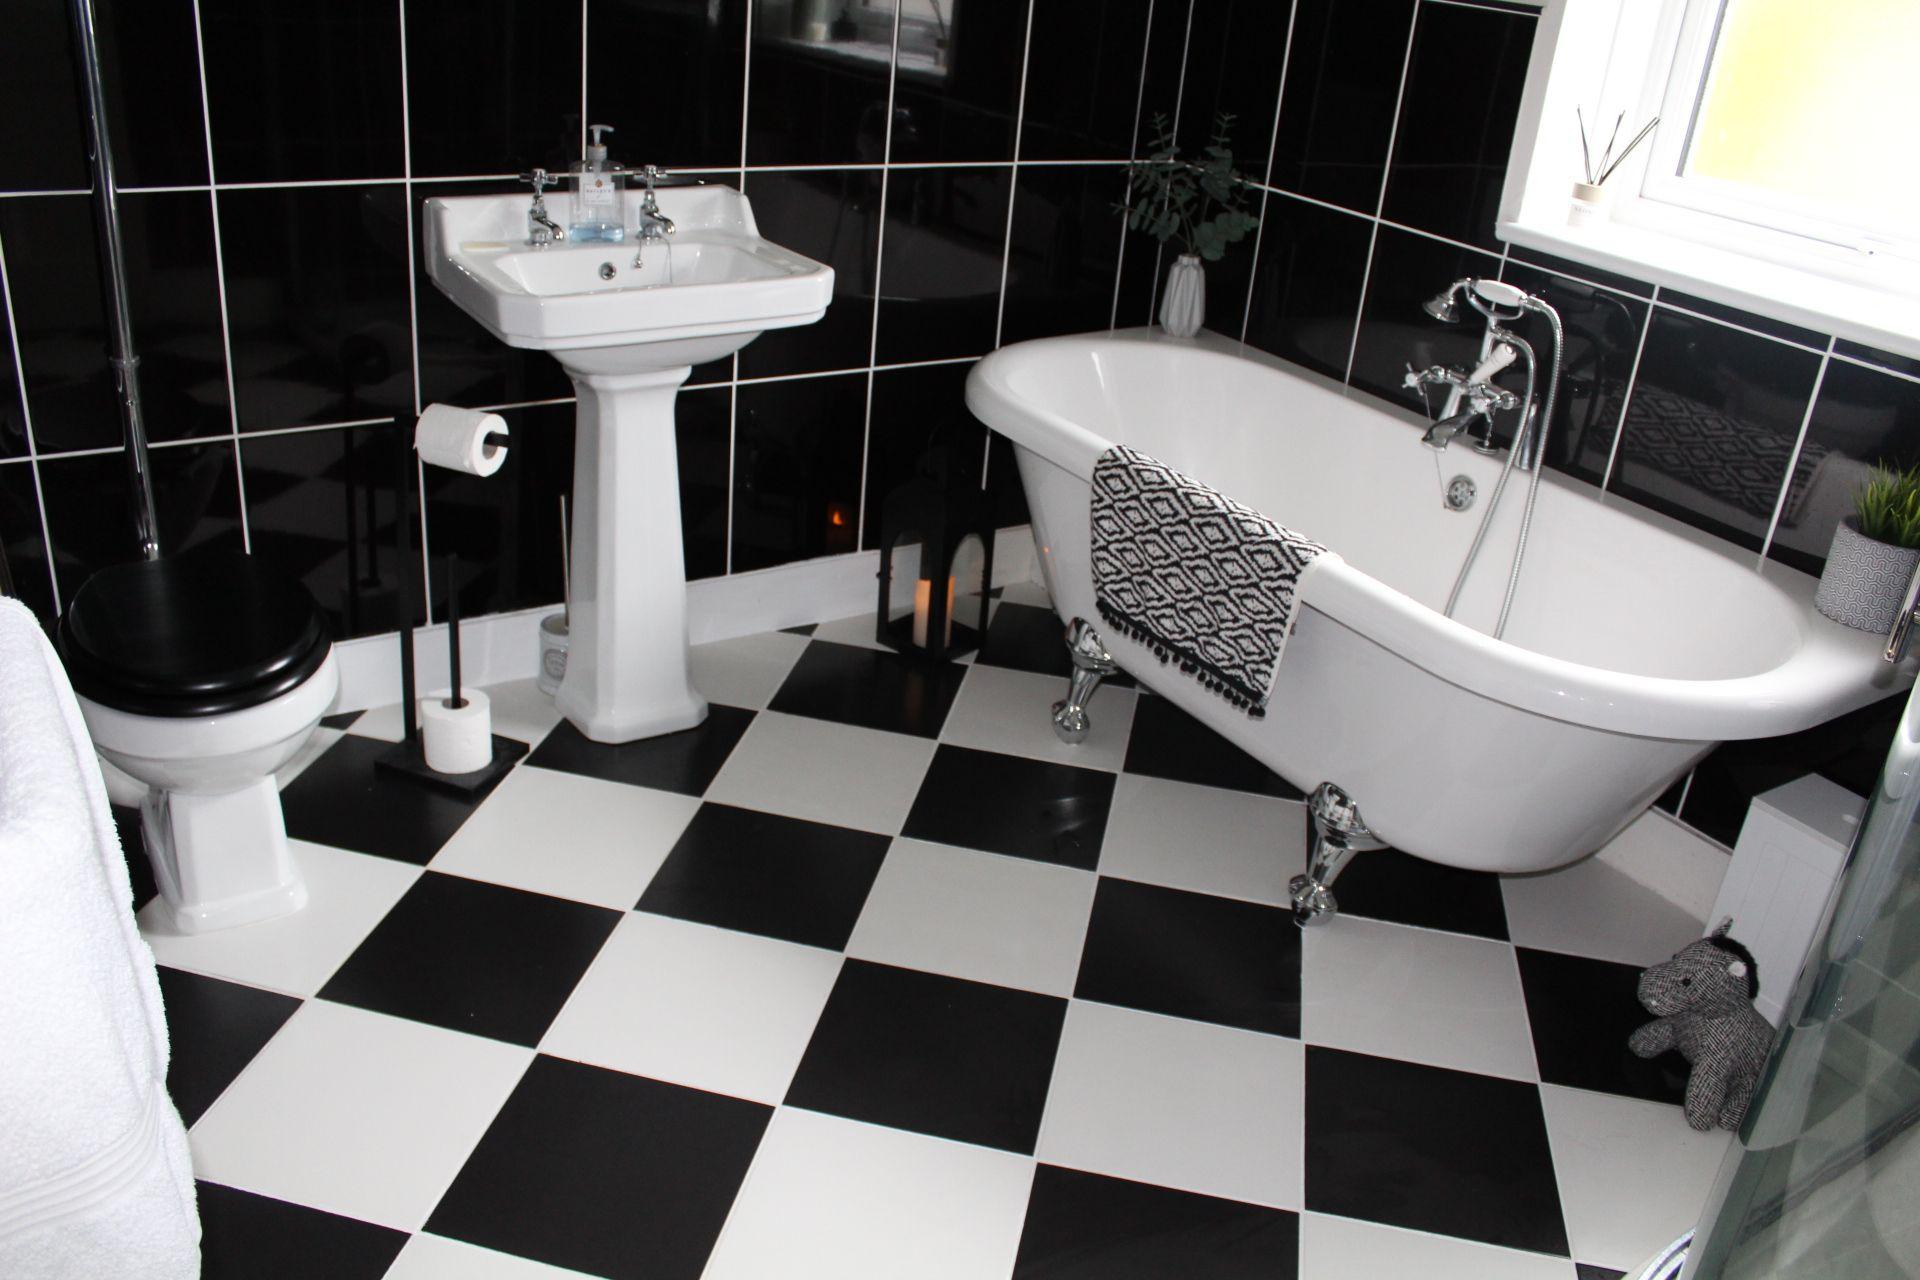 Black And White Checkered Tile Bathroom Floor Bathroom Design Black White Floors Black White Bathrooms